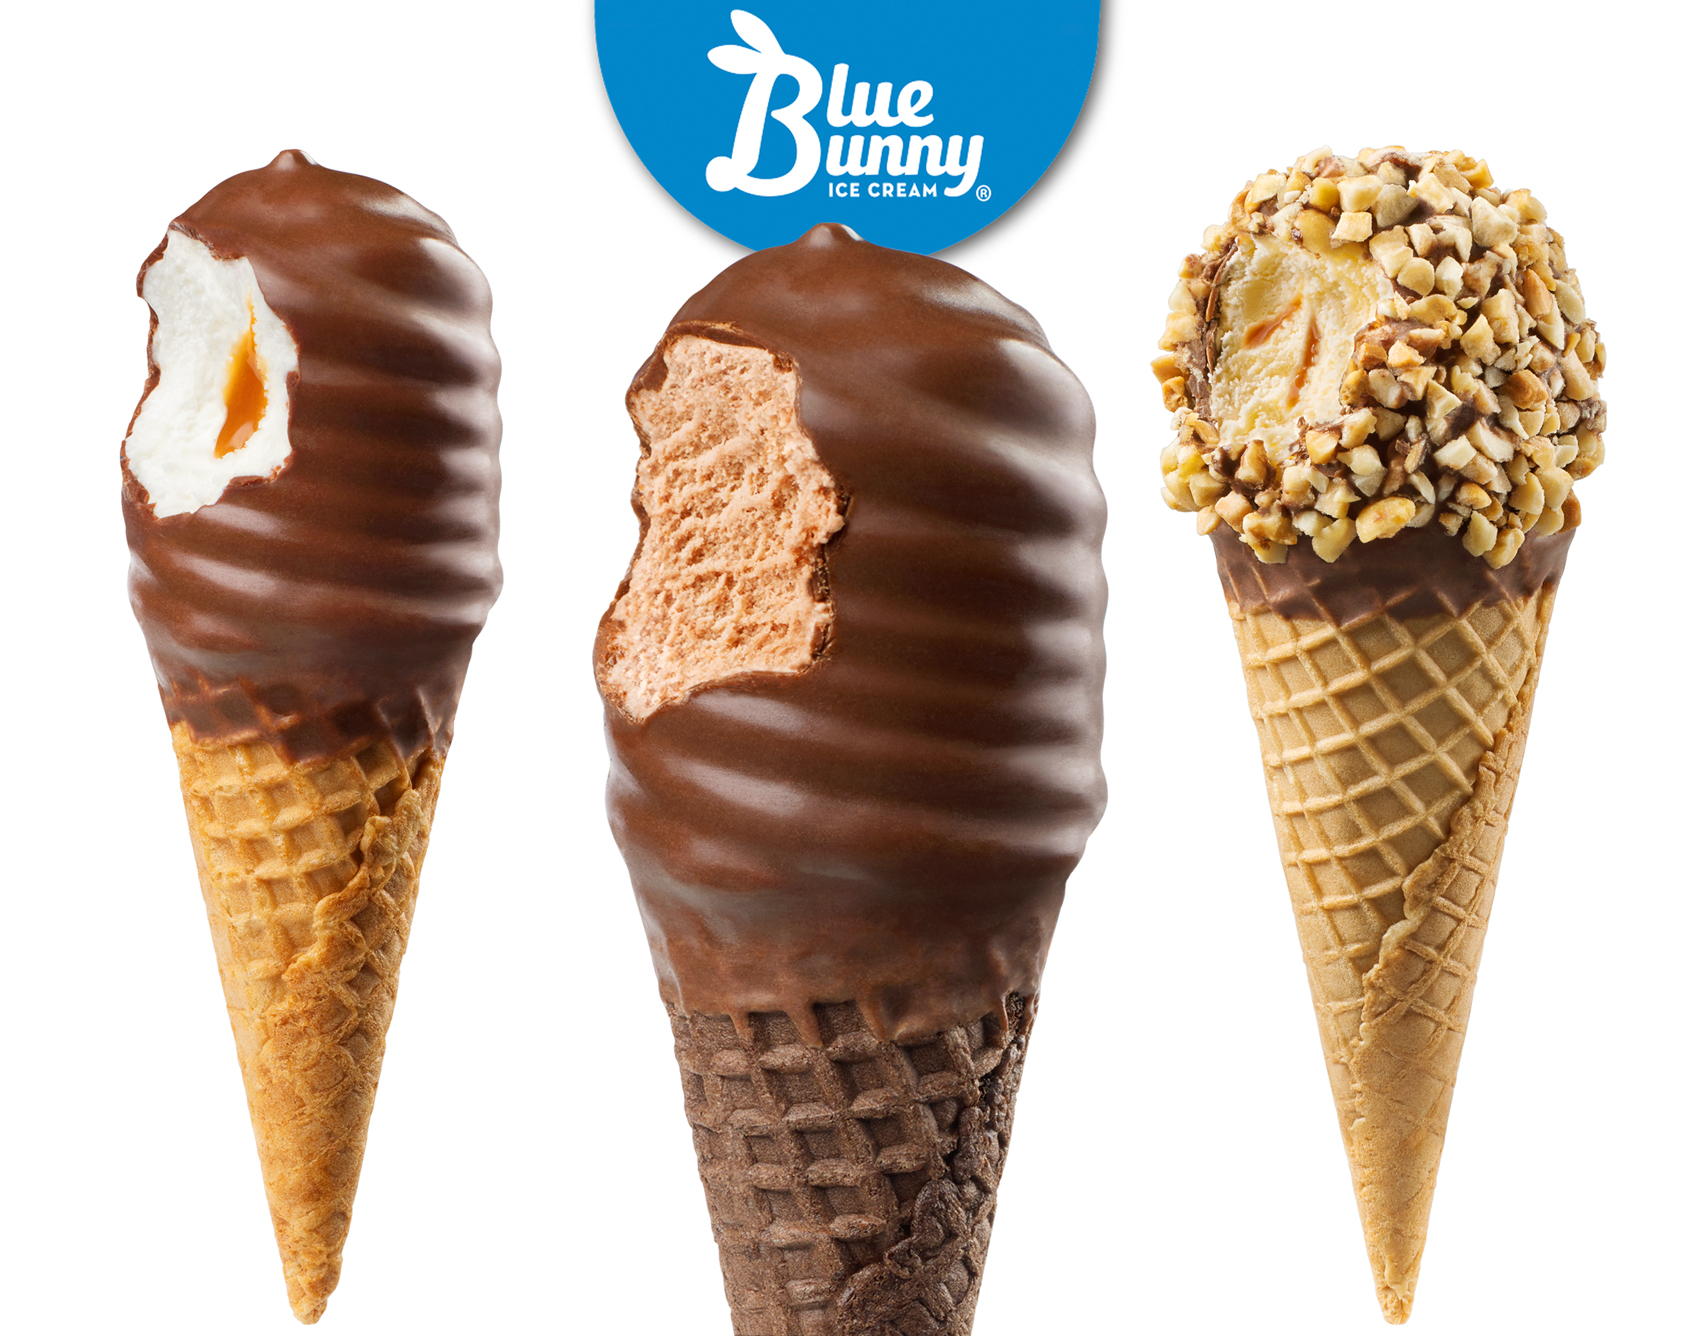 blue_bunny_ice_cream_cones.jpg